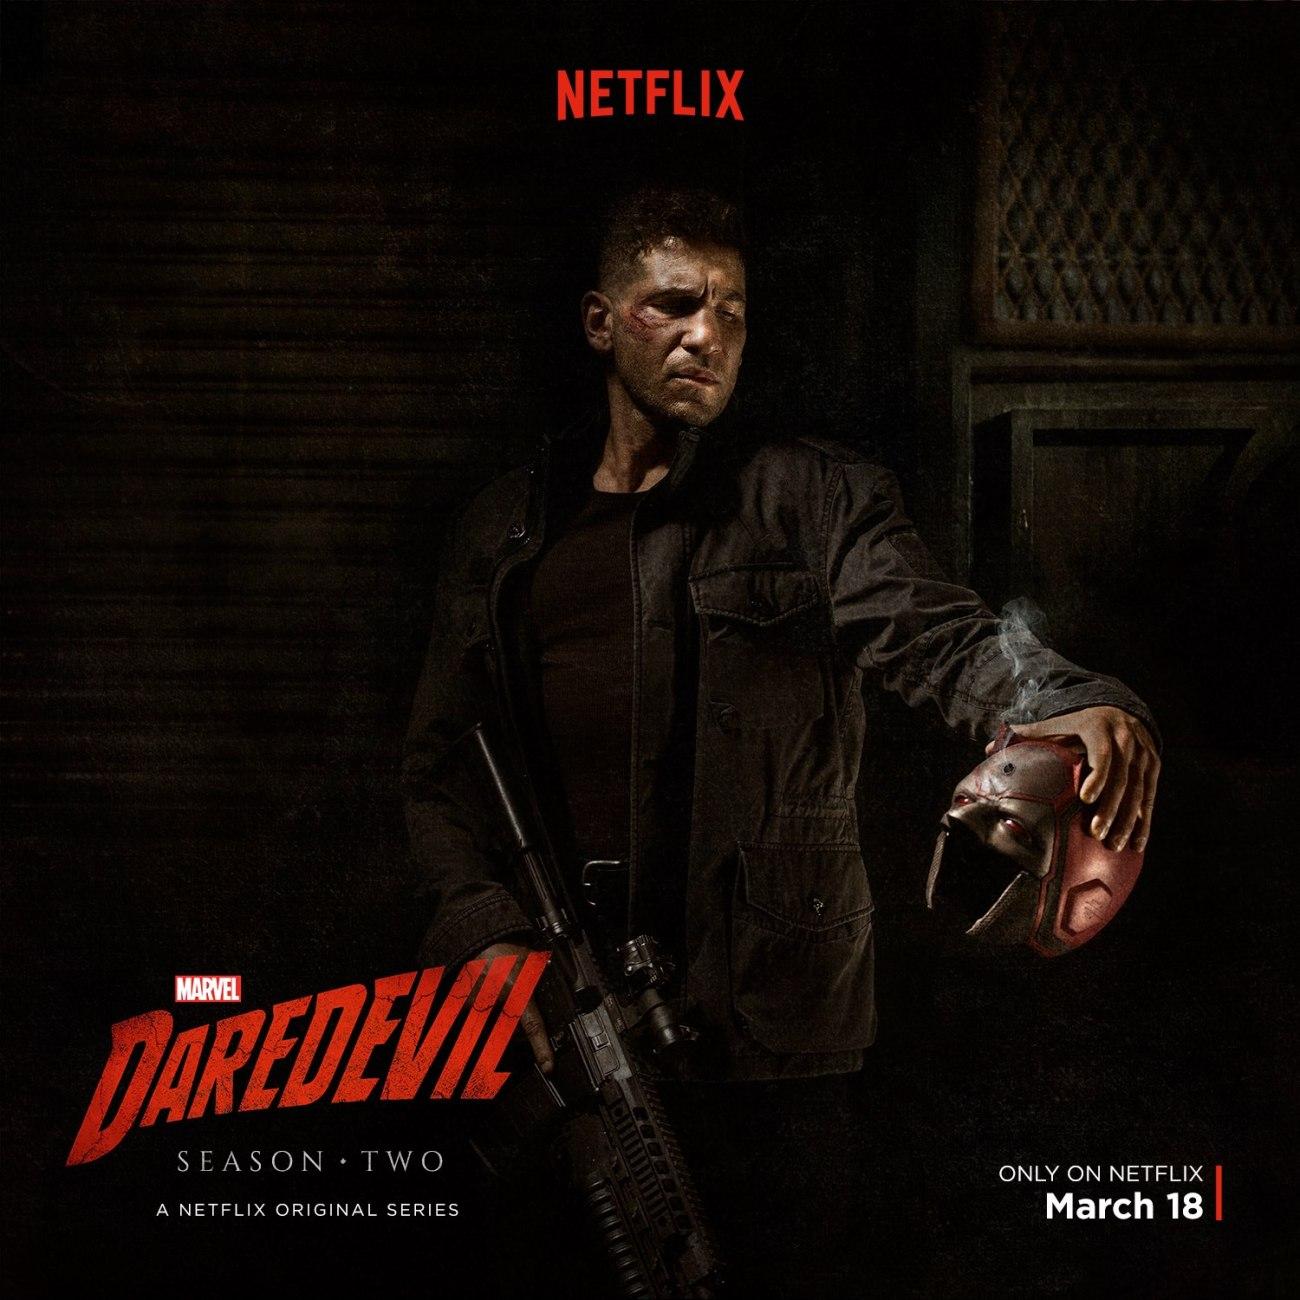 Frank Castle/The Punisher (John Bernthal) debutó en la temporada 2 de Daredevil. Imagen: SuperHeroHype